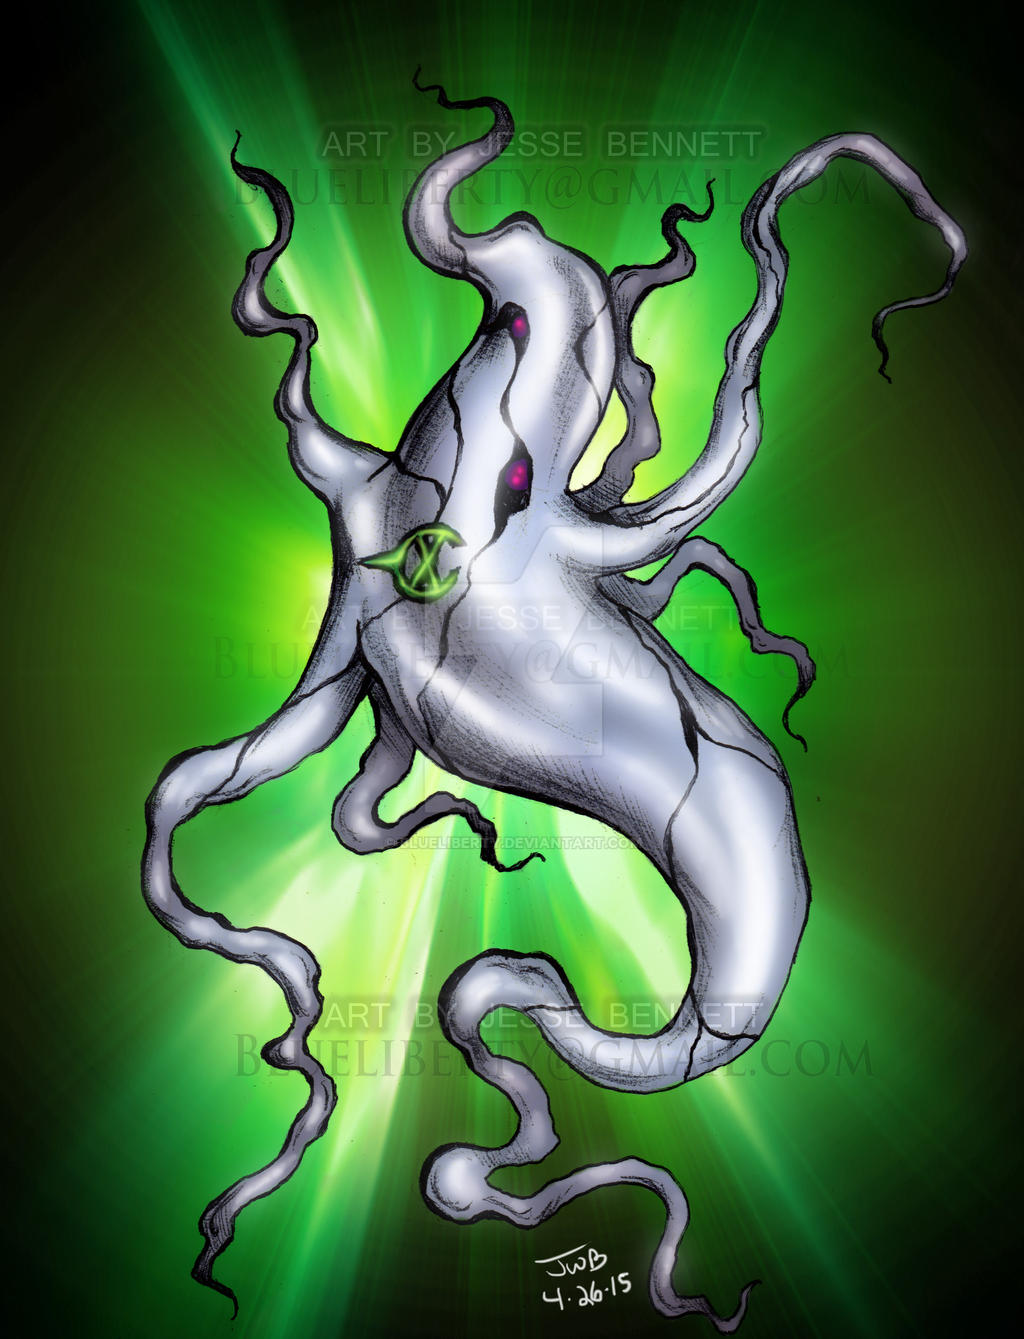 Ghostfreak Ben 10 by blueliberty on DeviantArt